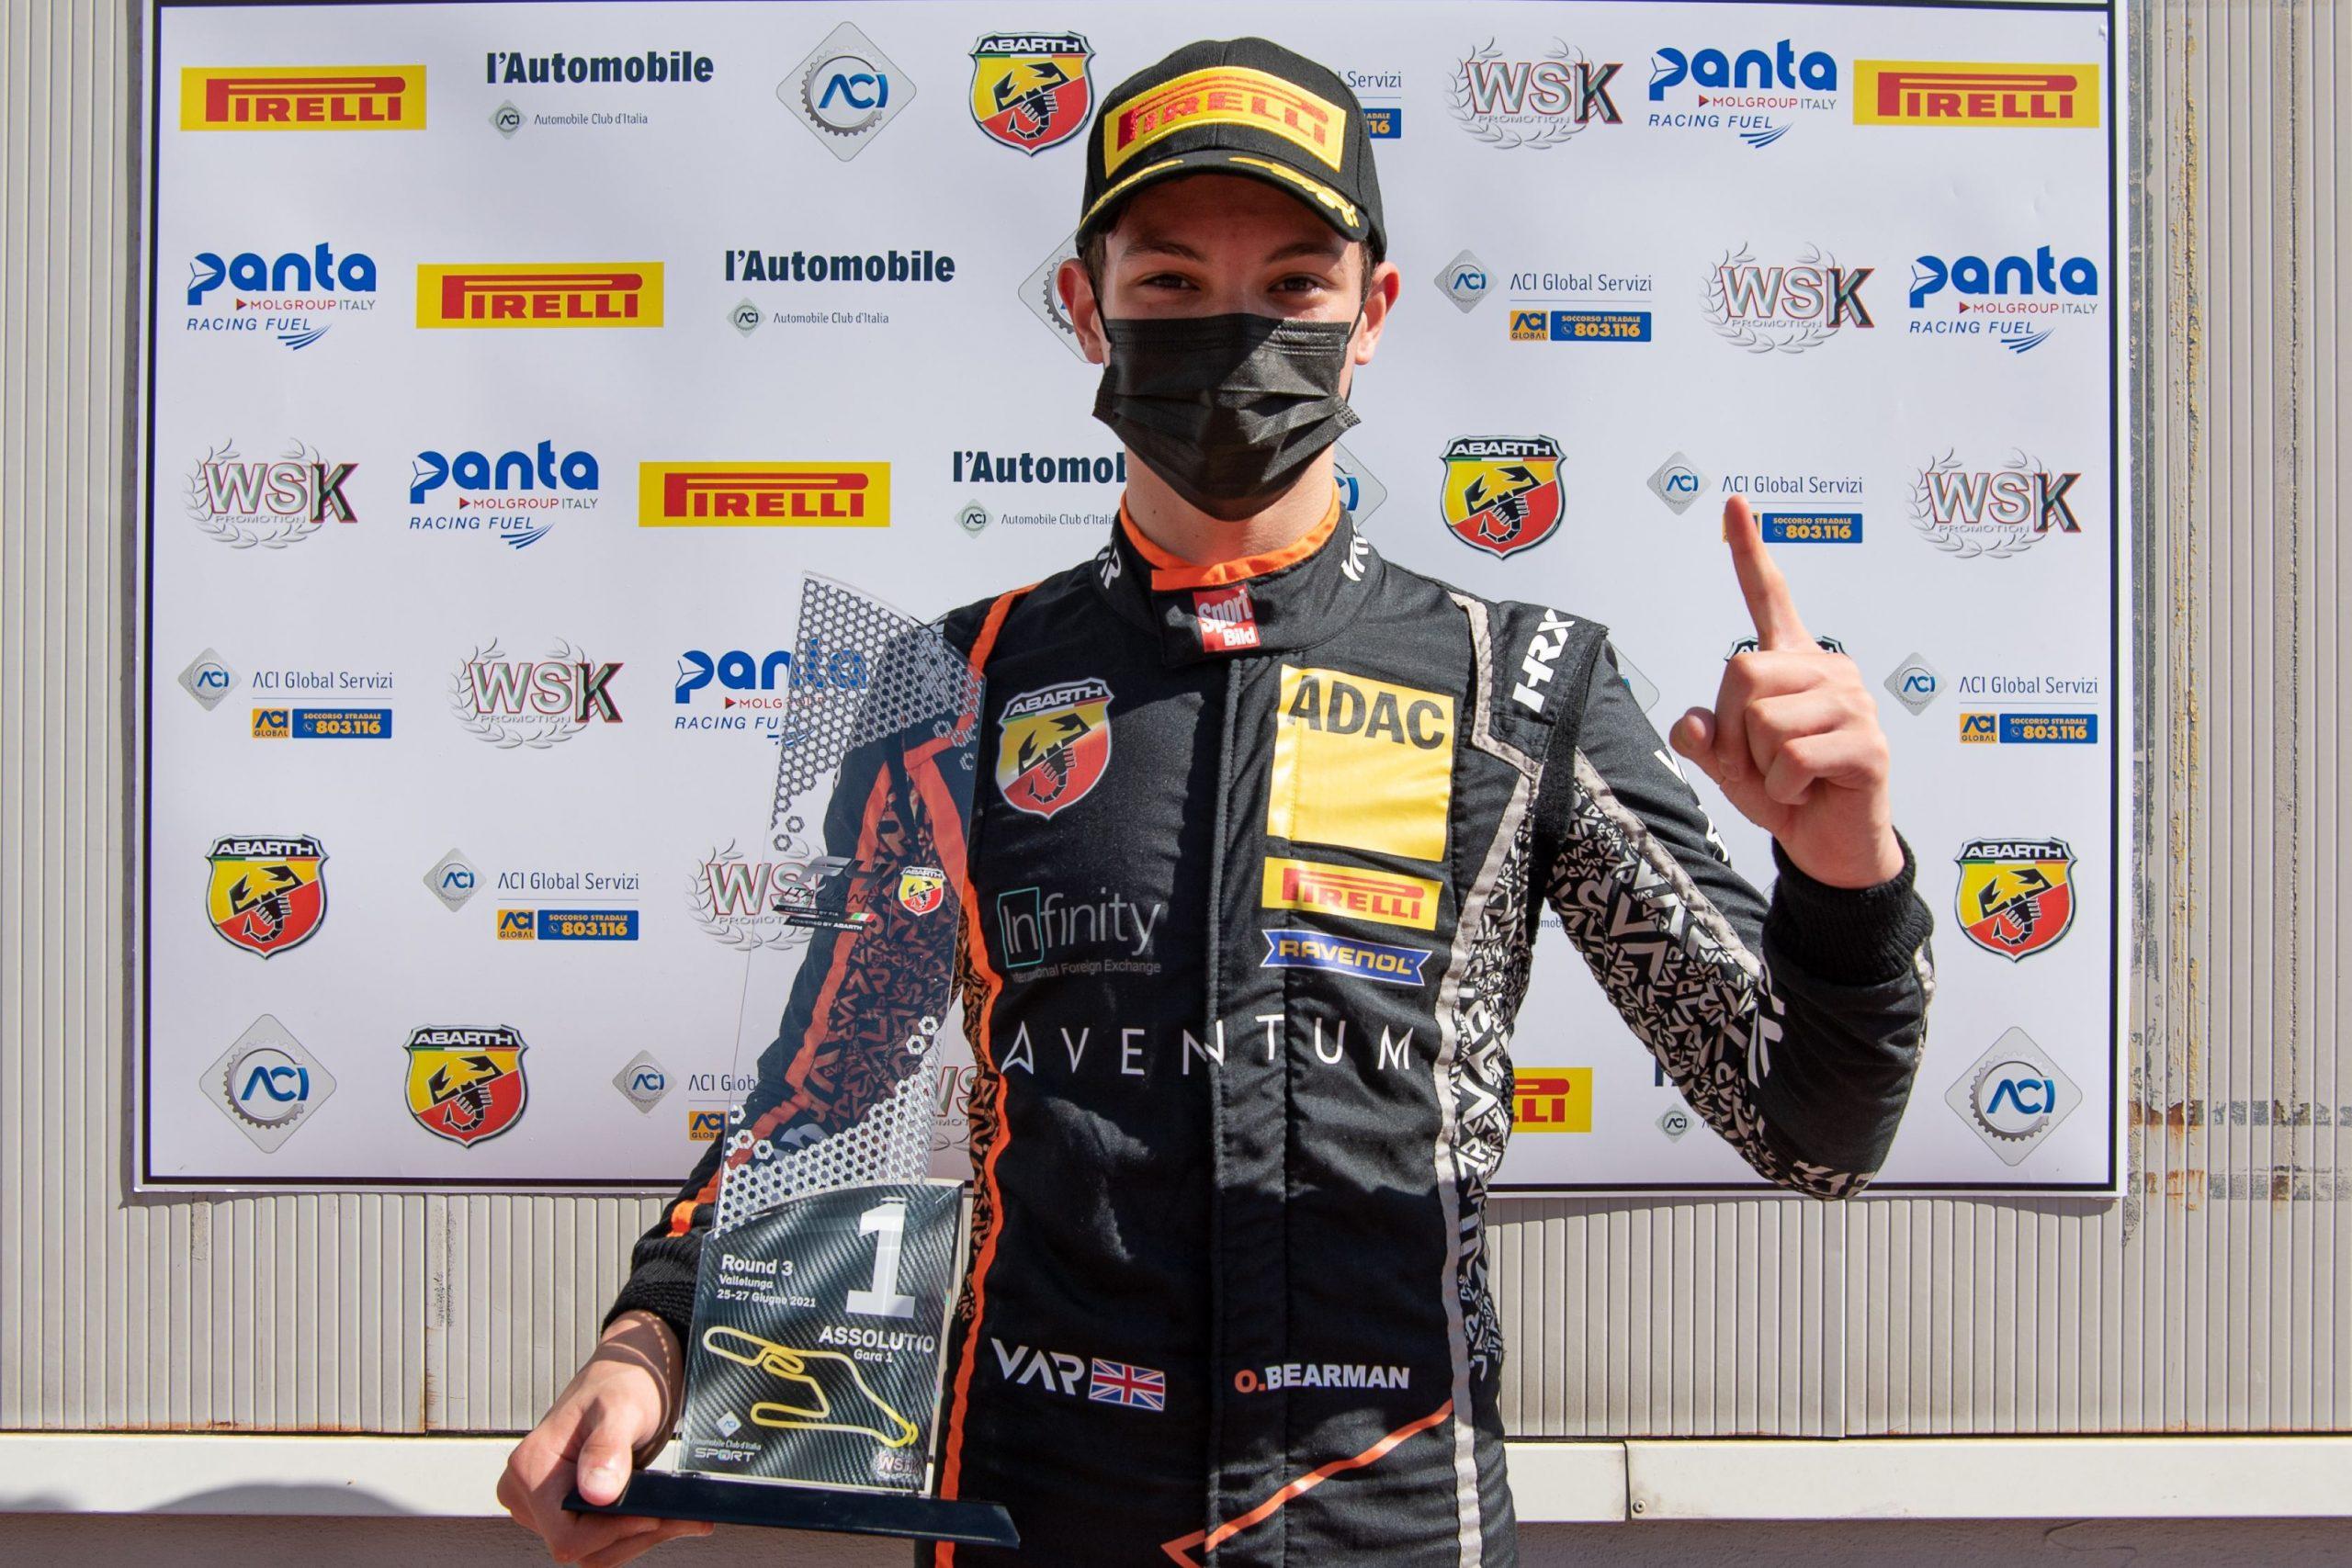 01 Oliver Bearman GBR 87 Van Amersfoort Racing Italian F.4 Championship Powered by Abarth Vallelunga scaled Τριπλή νίκη για τον Oliver Bearman στη Vallelunga Abarth, Formula 4, αγωνες, ειδήσεις, Νέα